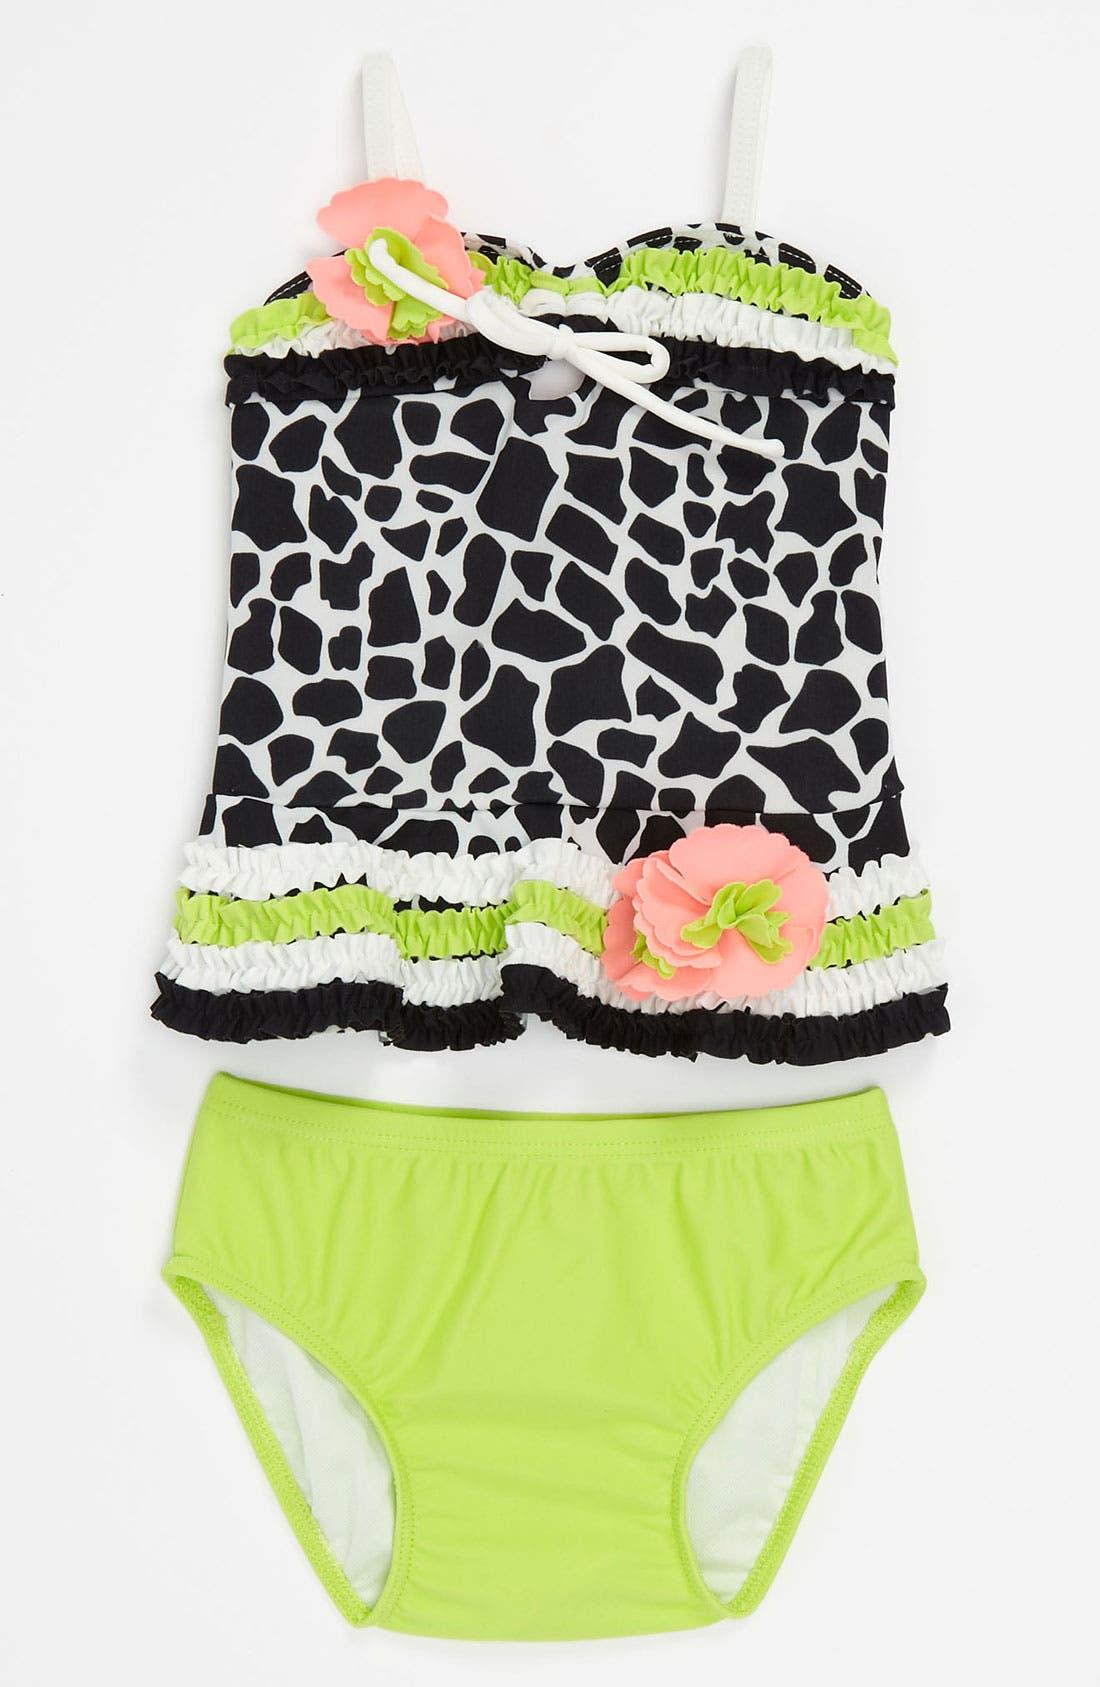 Alternate Image 1 Selected - Isobella & Chloe 'Safari Print' Two Piece Swimsuit (Infant)